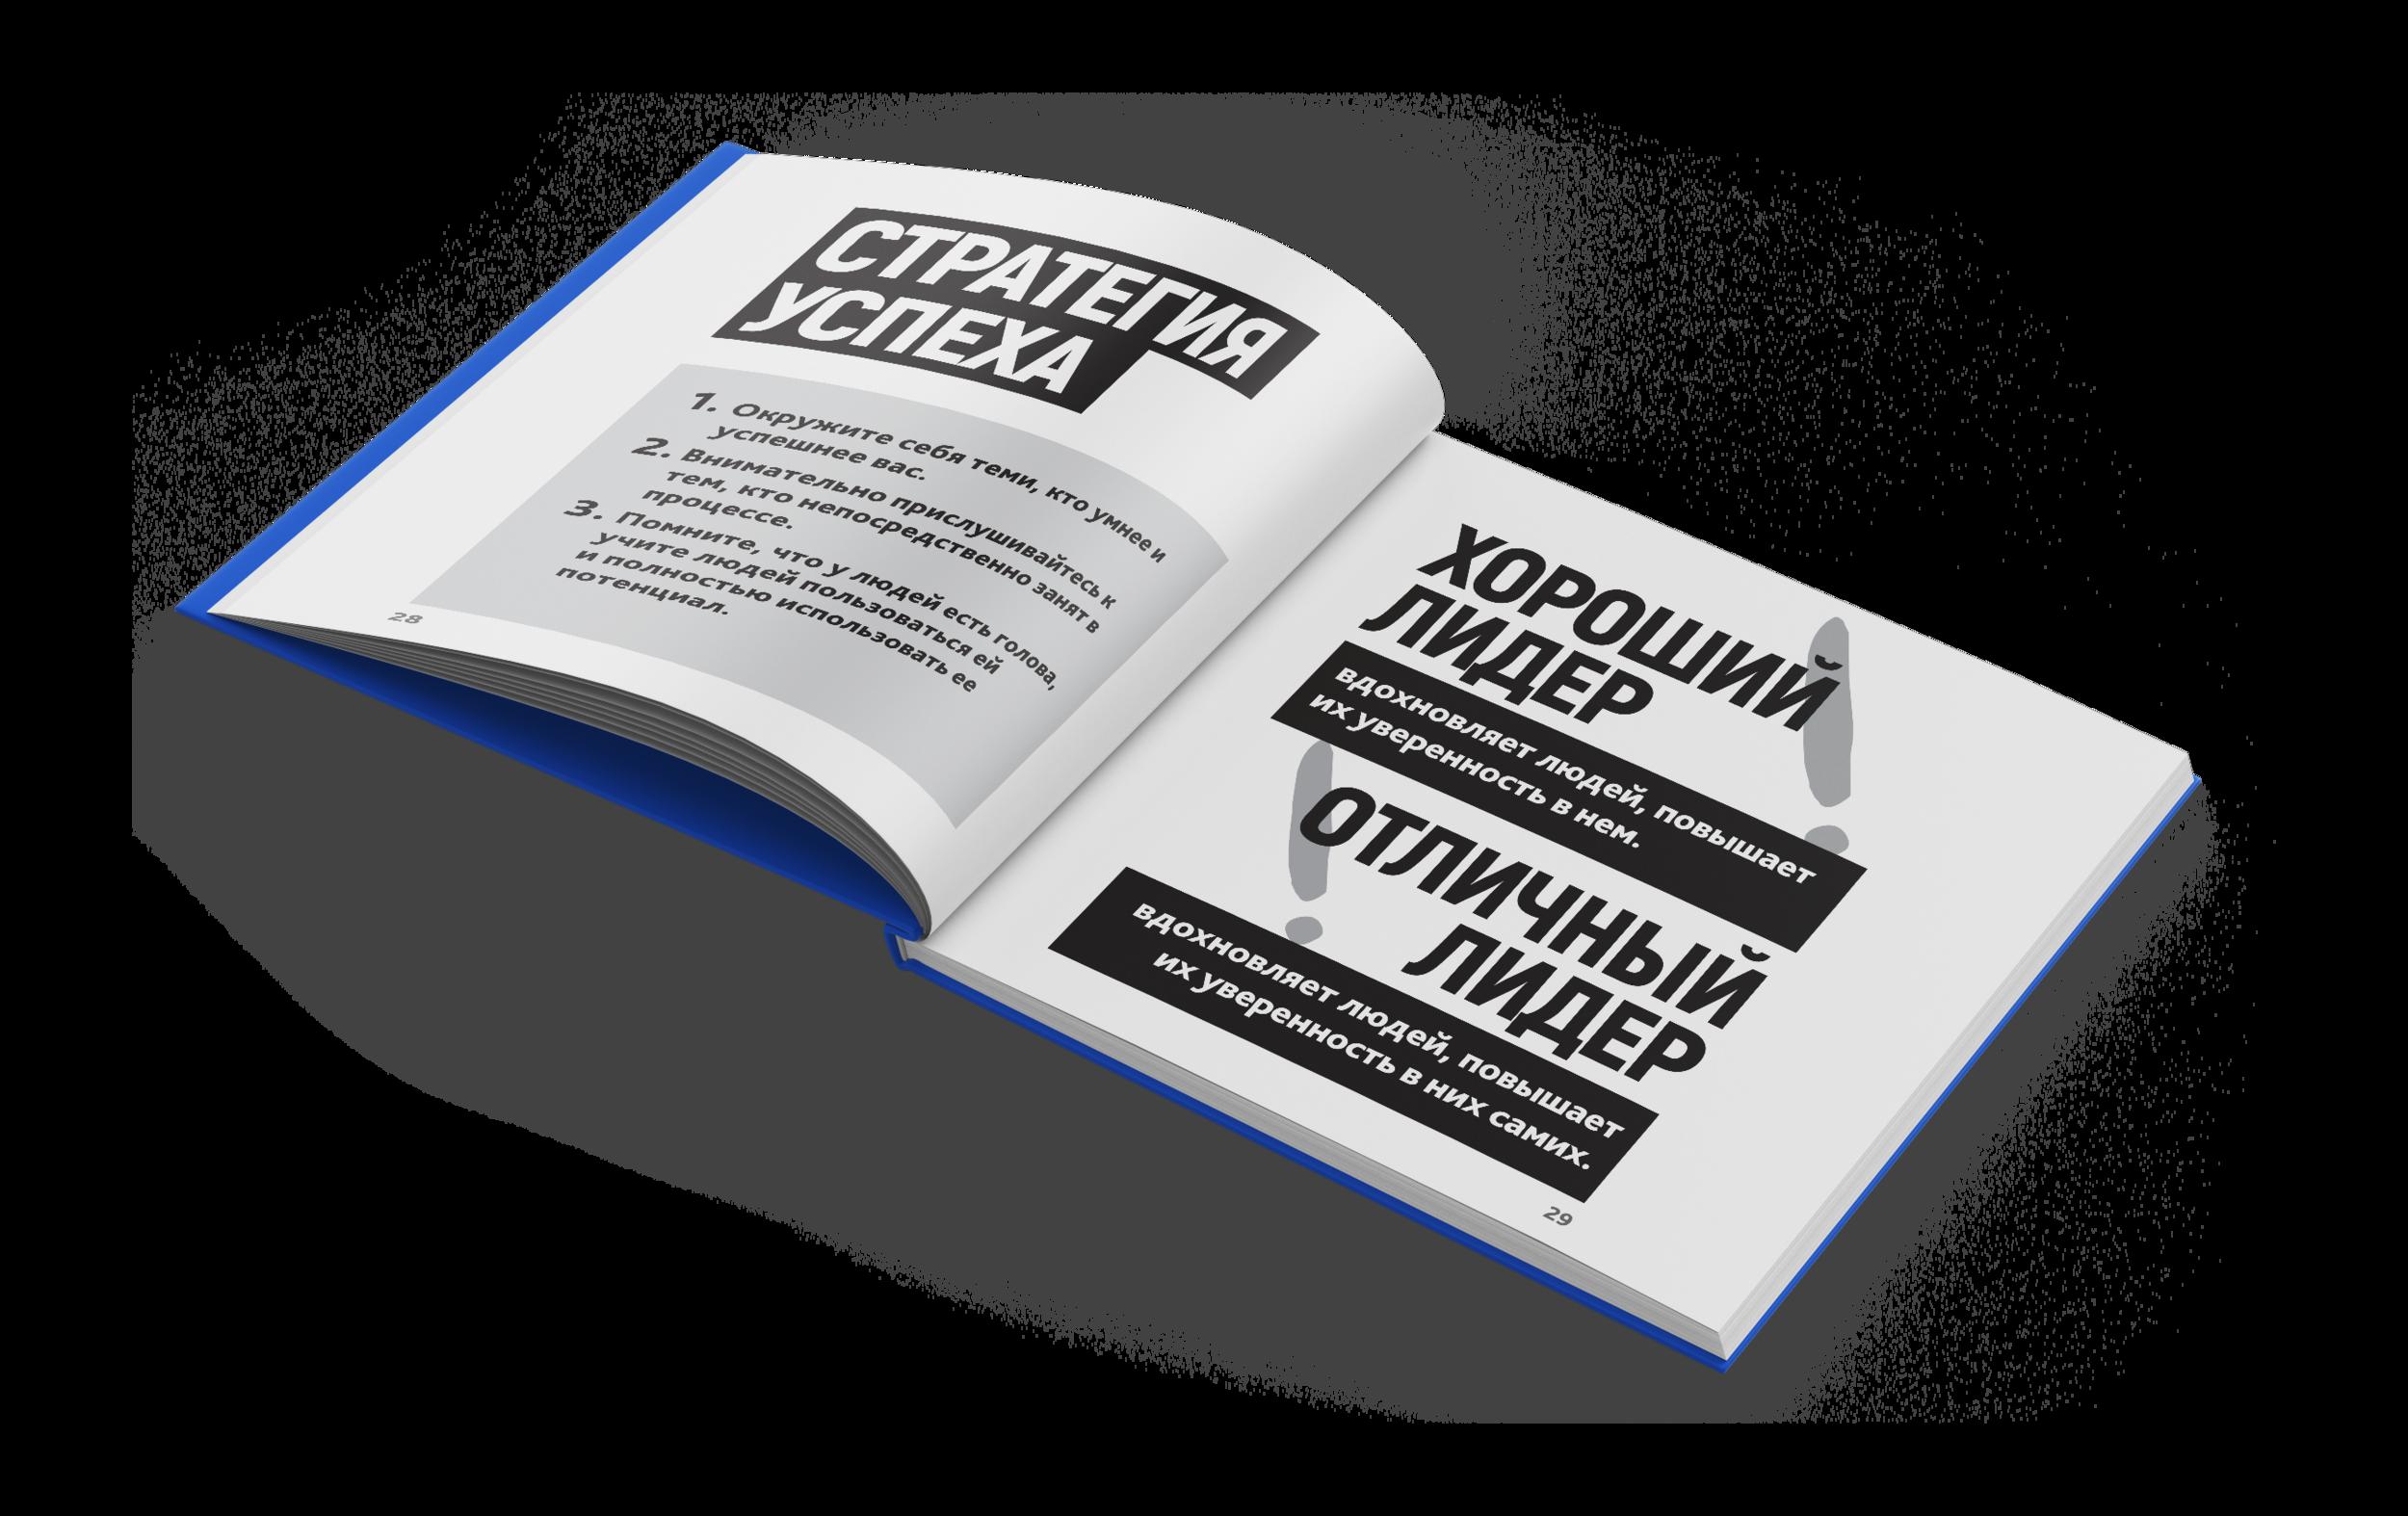 Square_Book_Mockup_5_ru.png